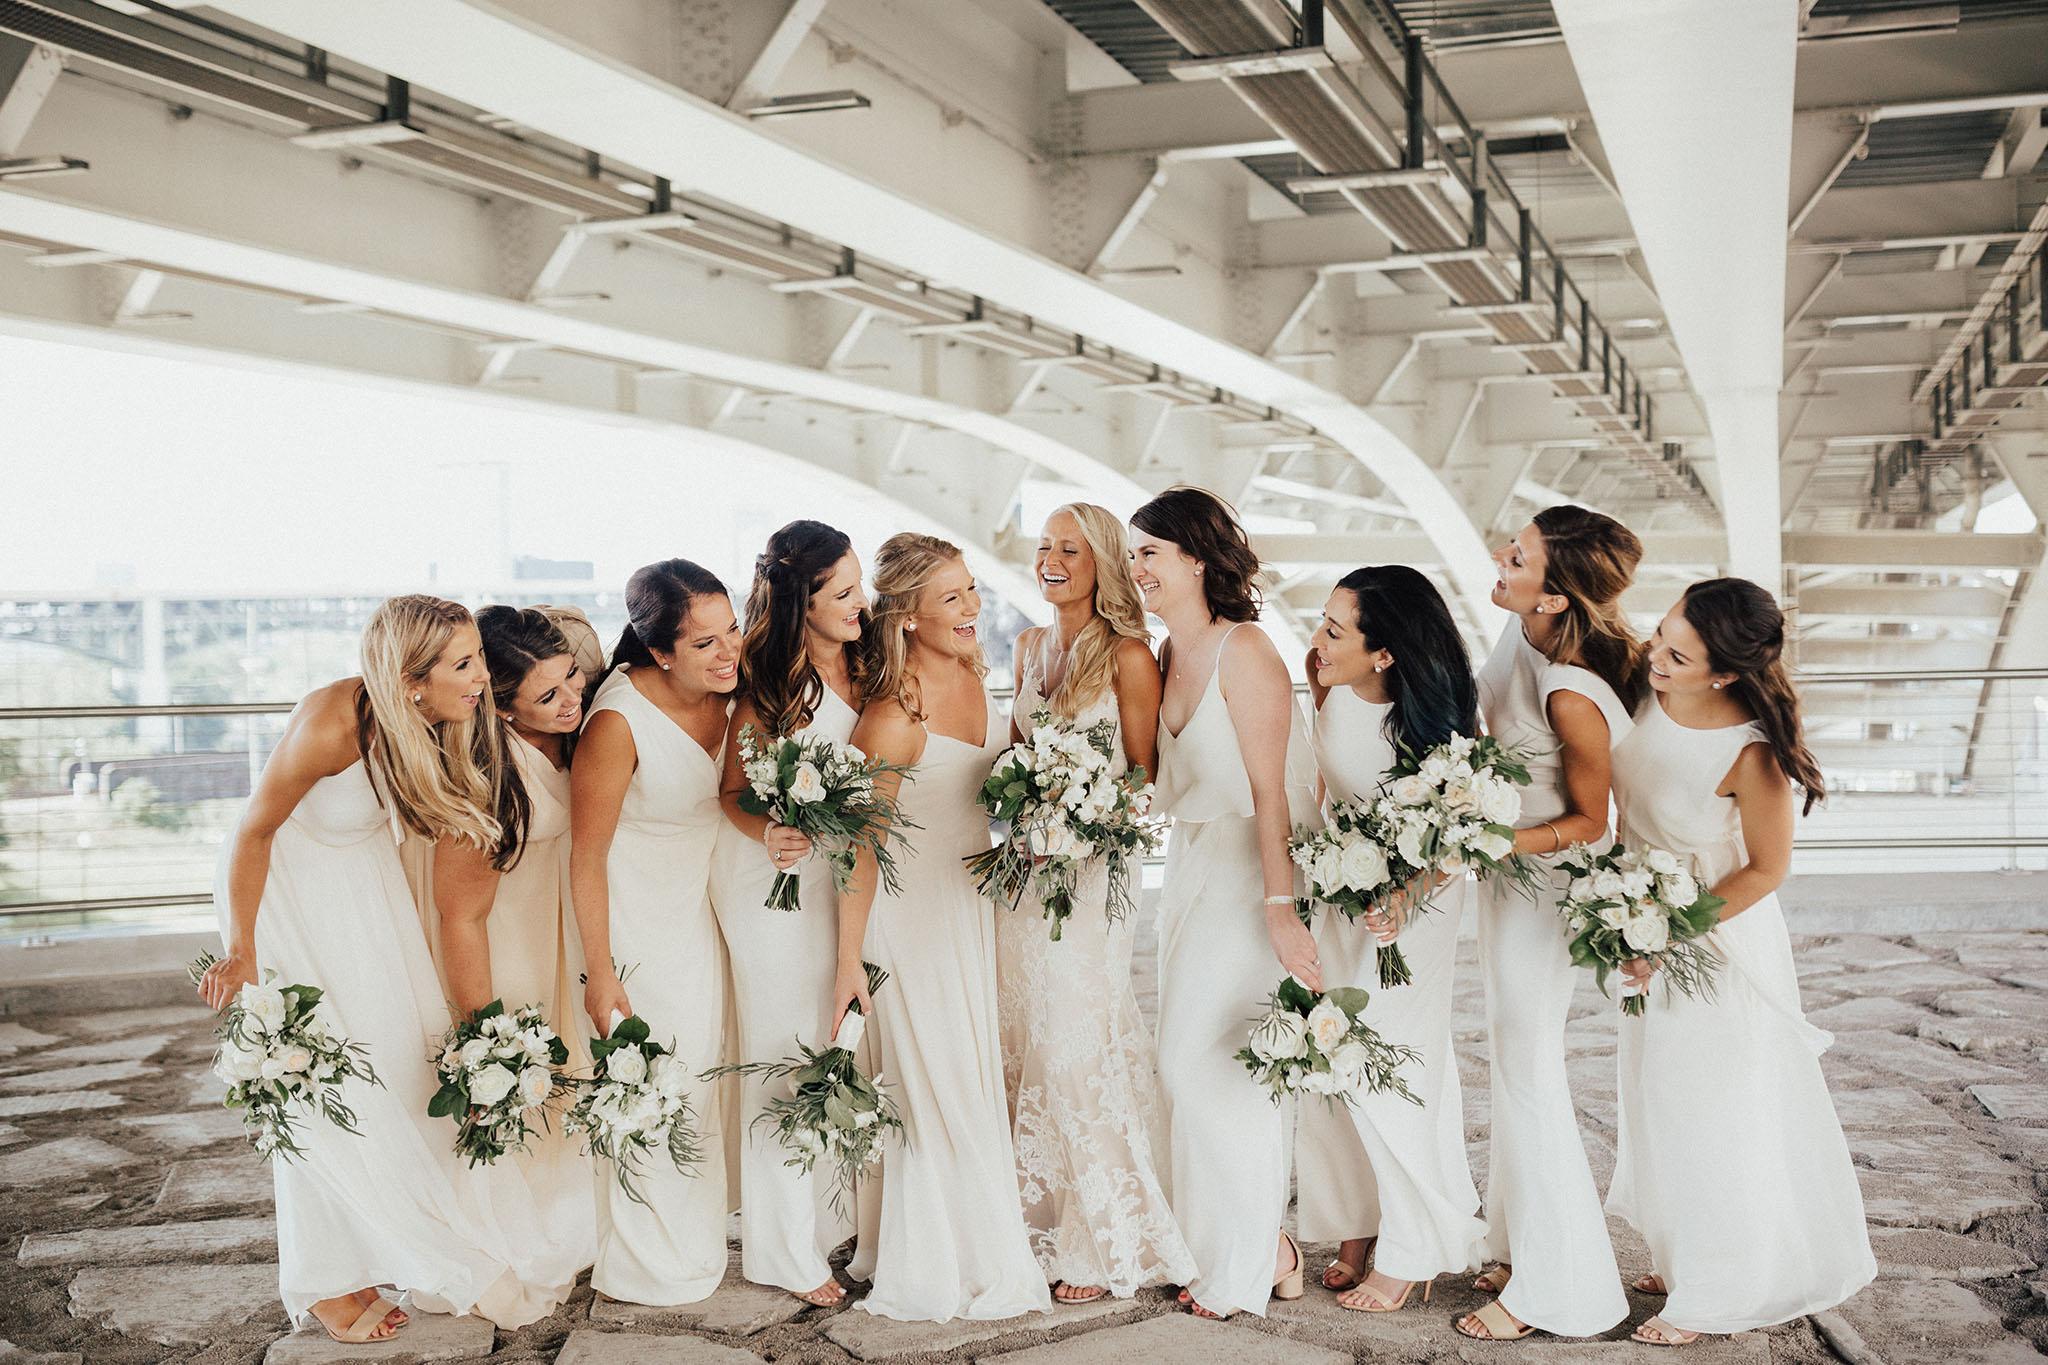 Artistic-Arizona-Wedding-Photographer (44).jpg